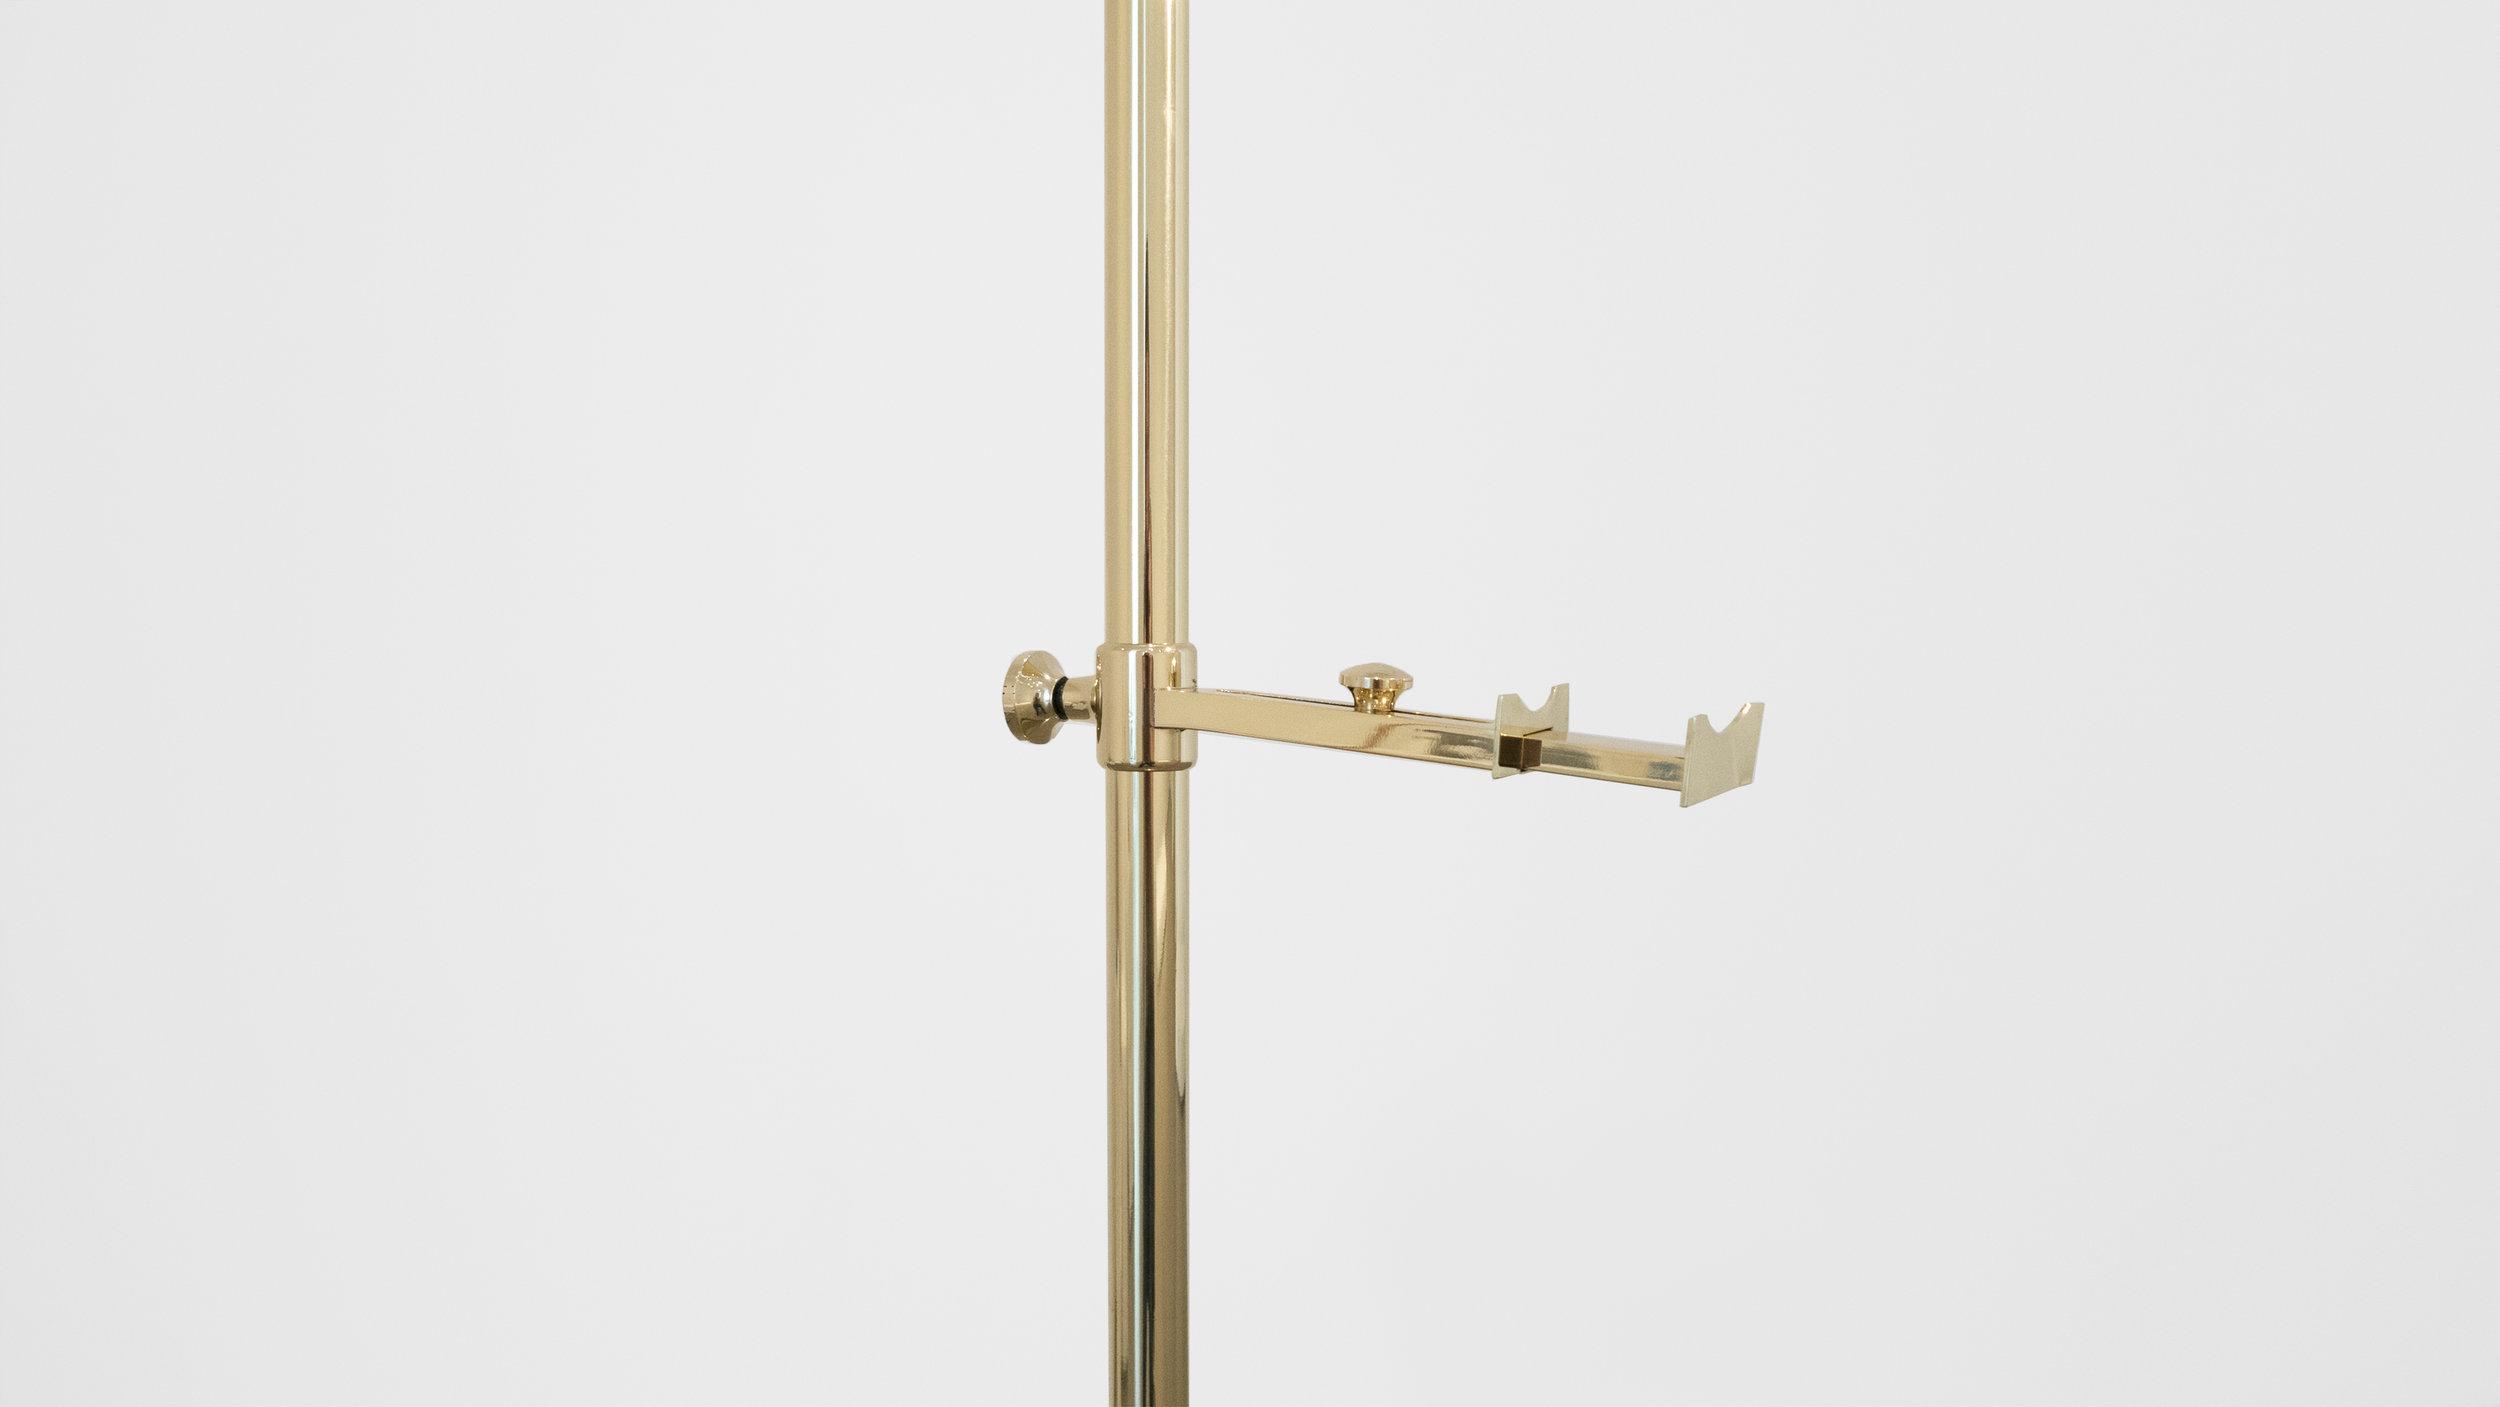 Angelo Lelli Easel Lamp for Arredoluce, c. 1950-1959, Brass, 82 H x 22.5 W x 33 D inches_2.jpg